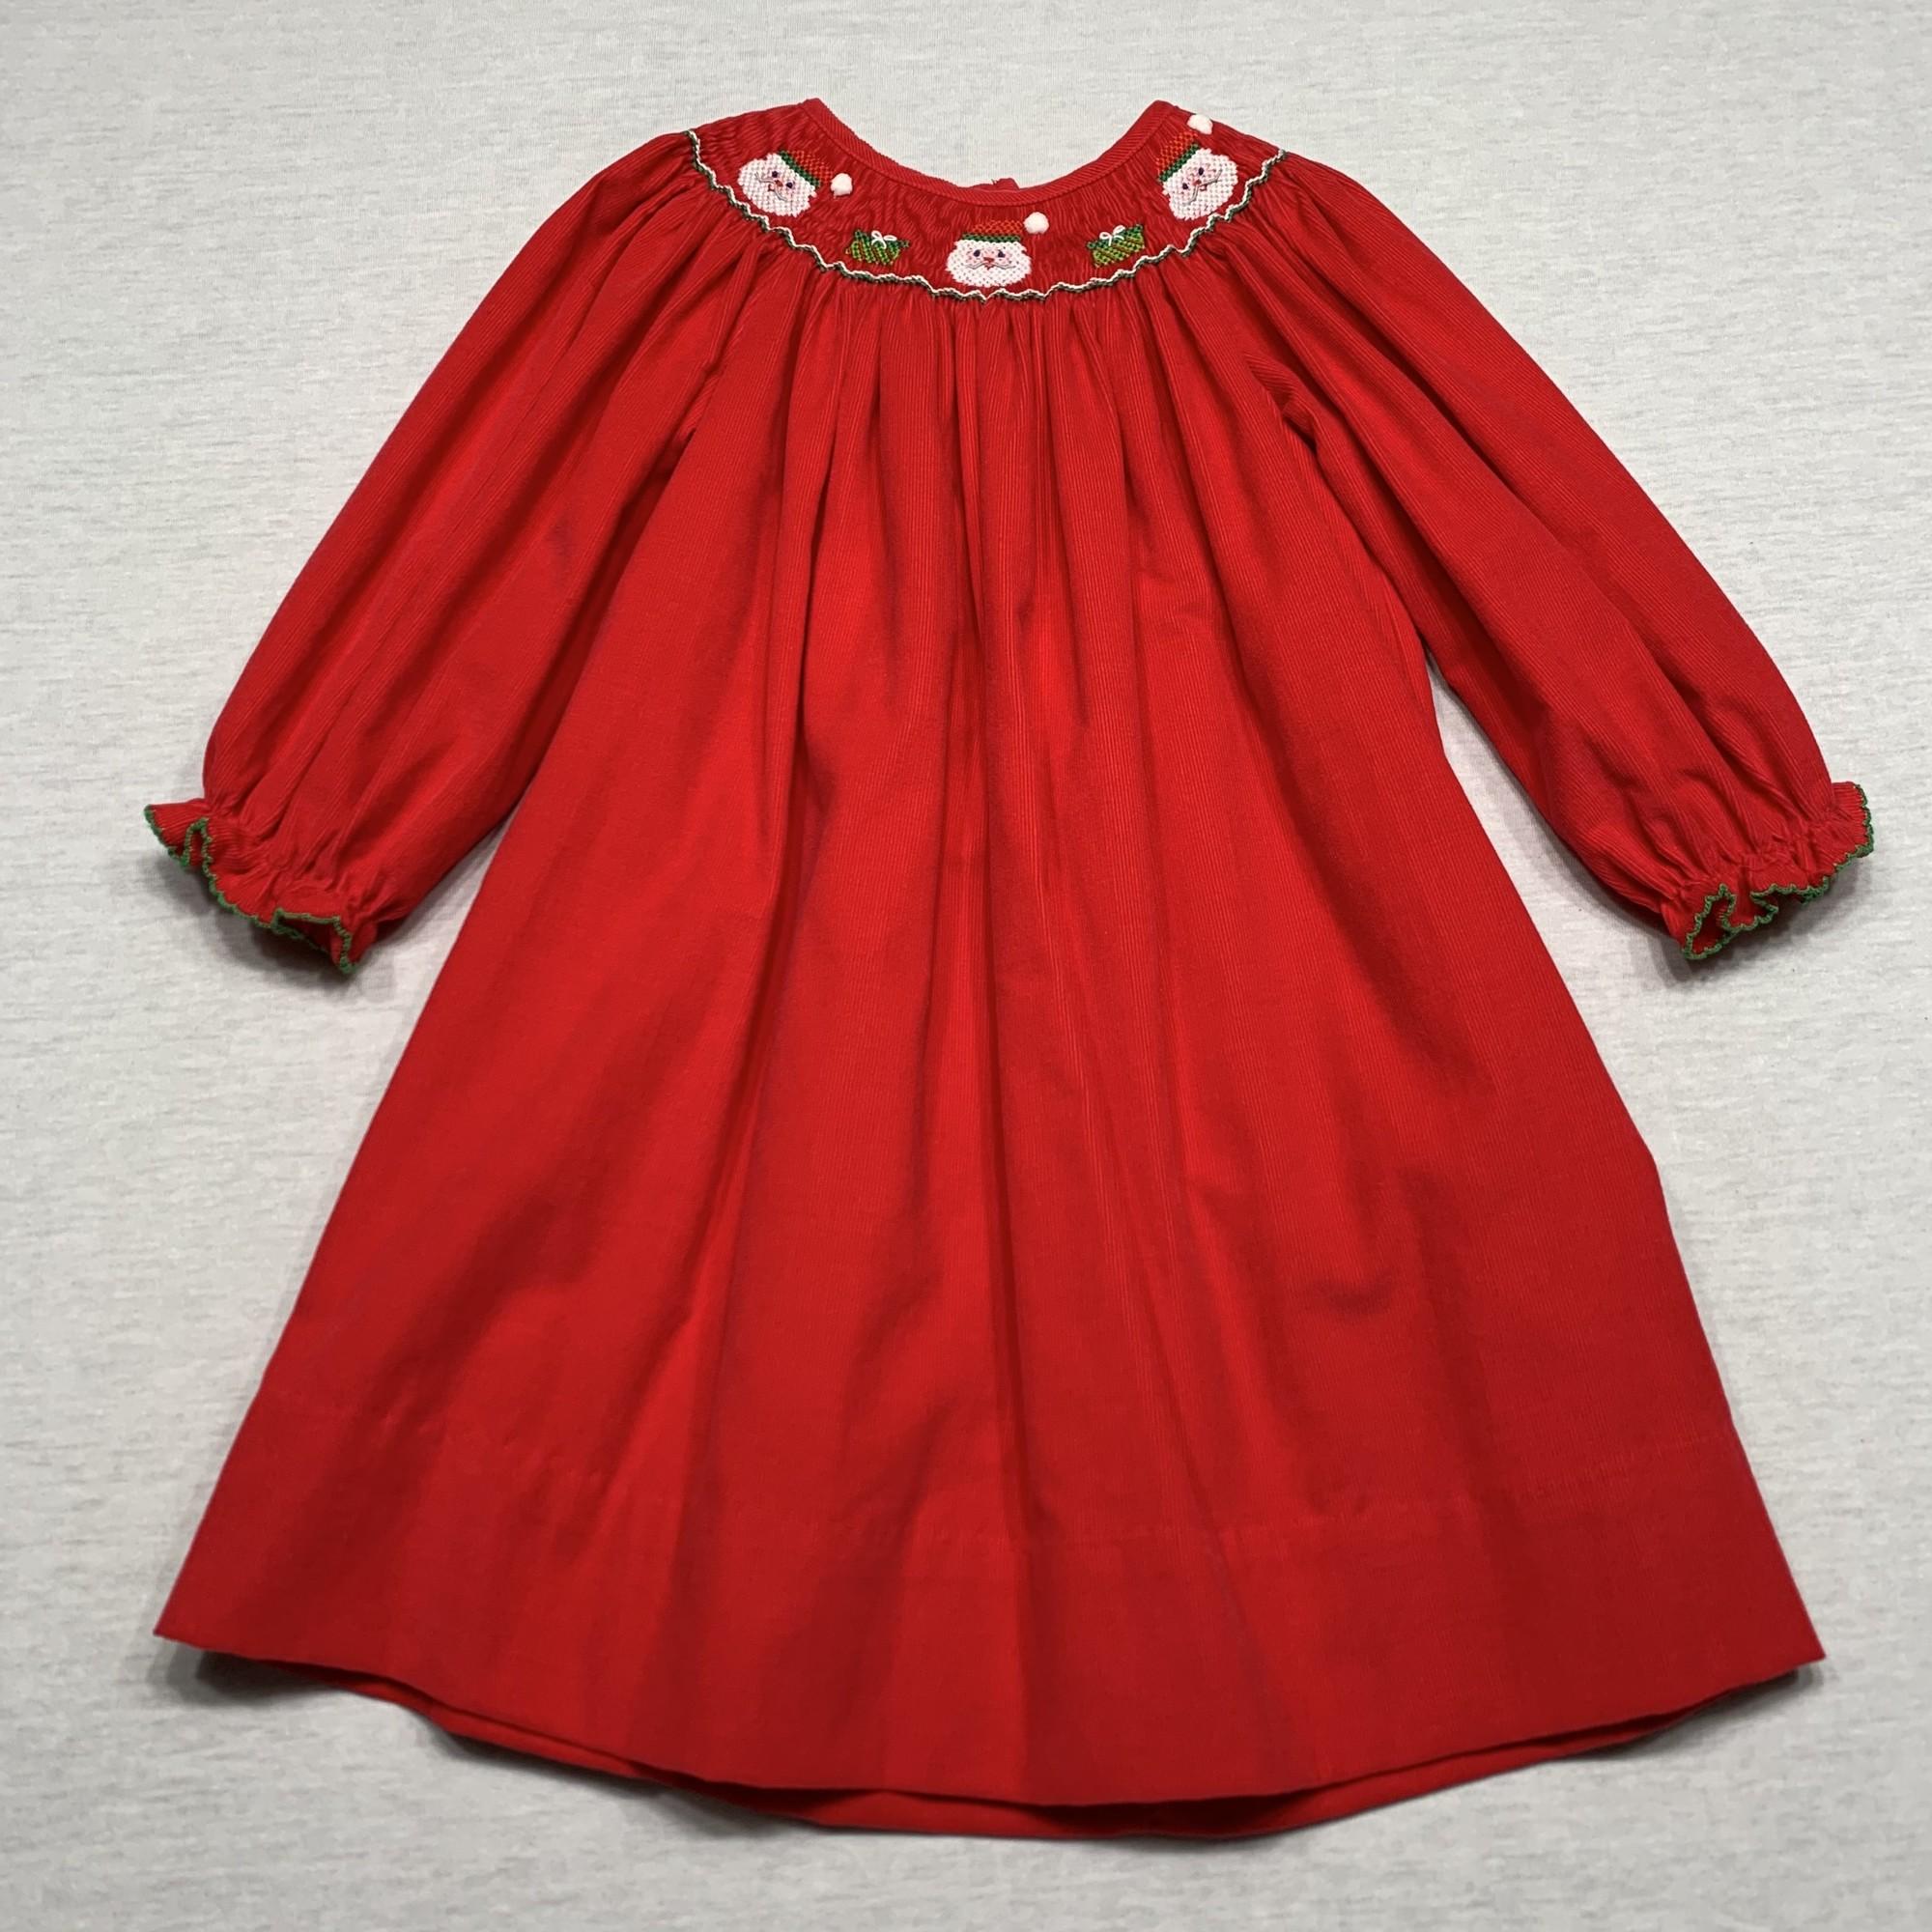 Bishop style corduroy smocked dress